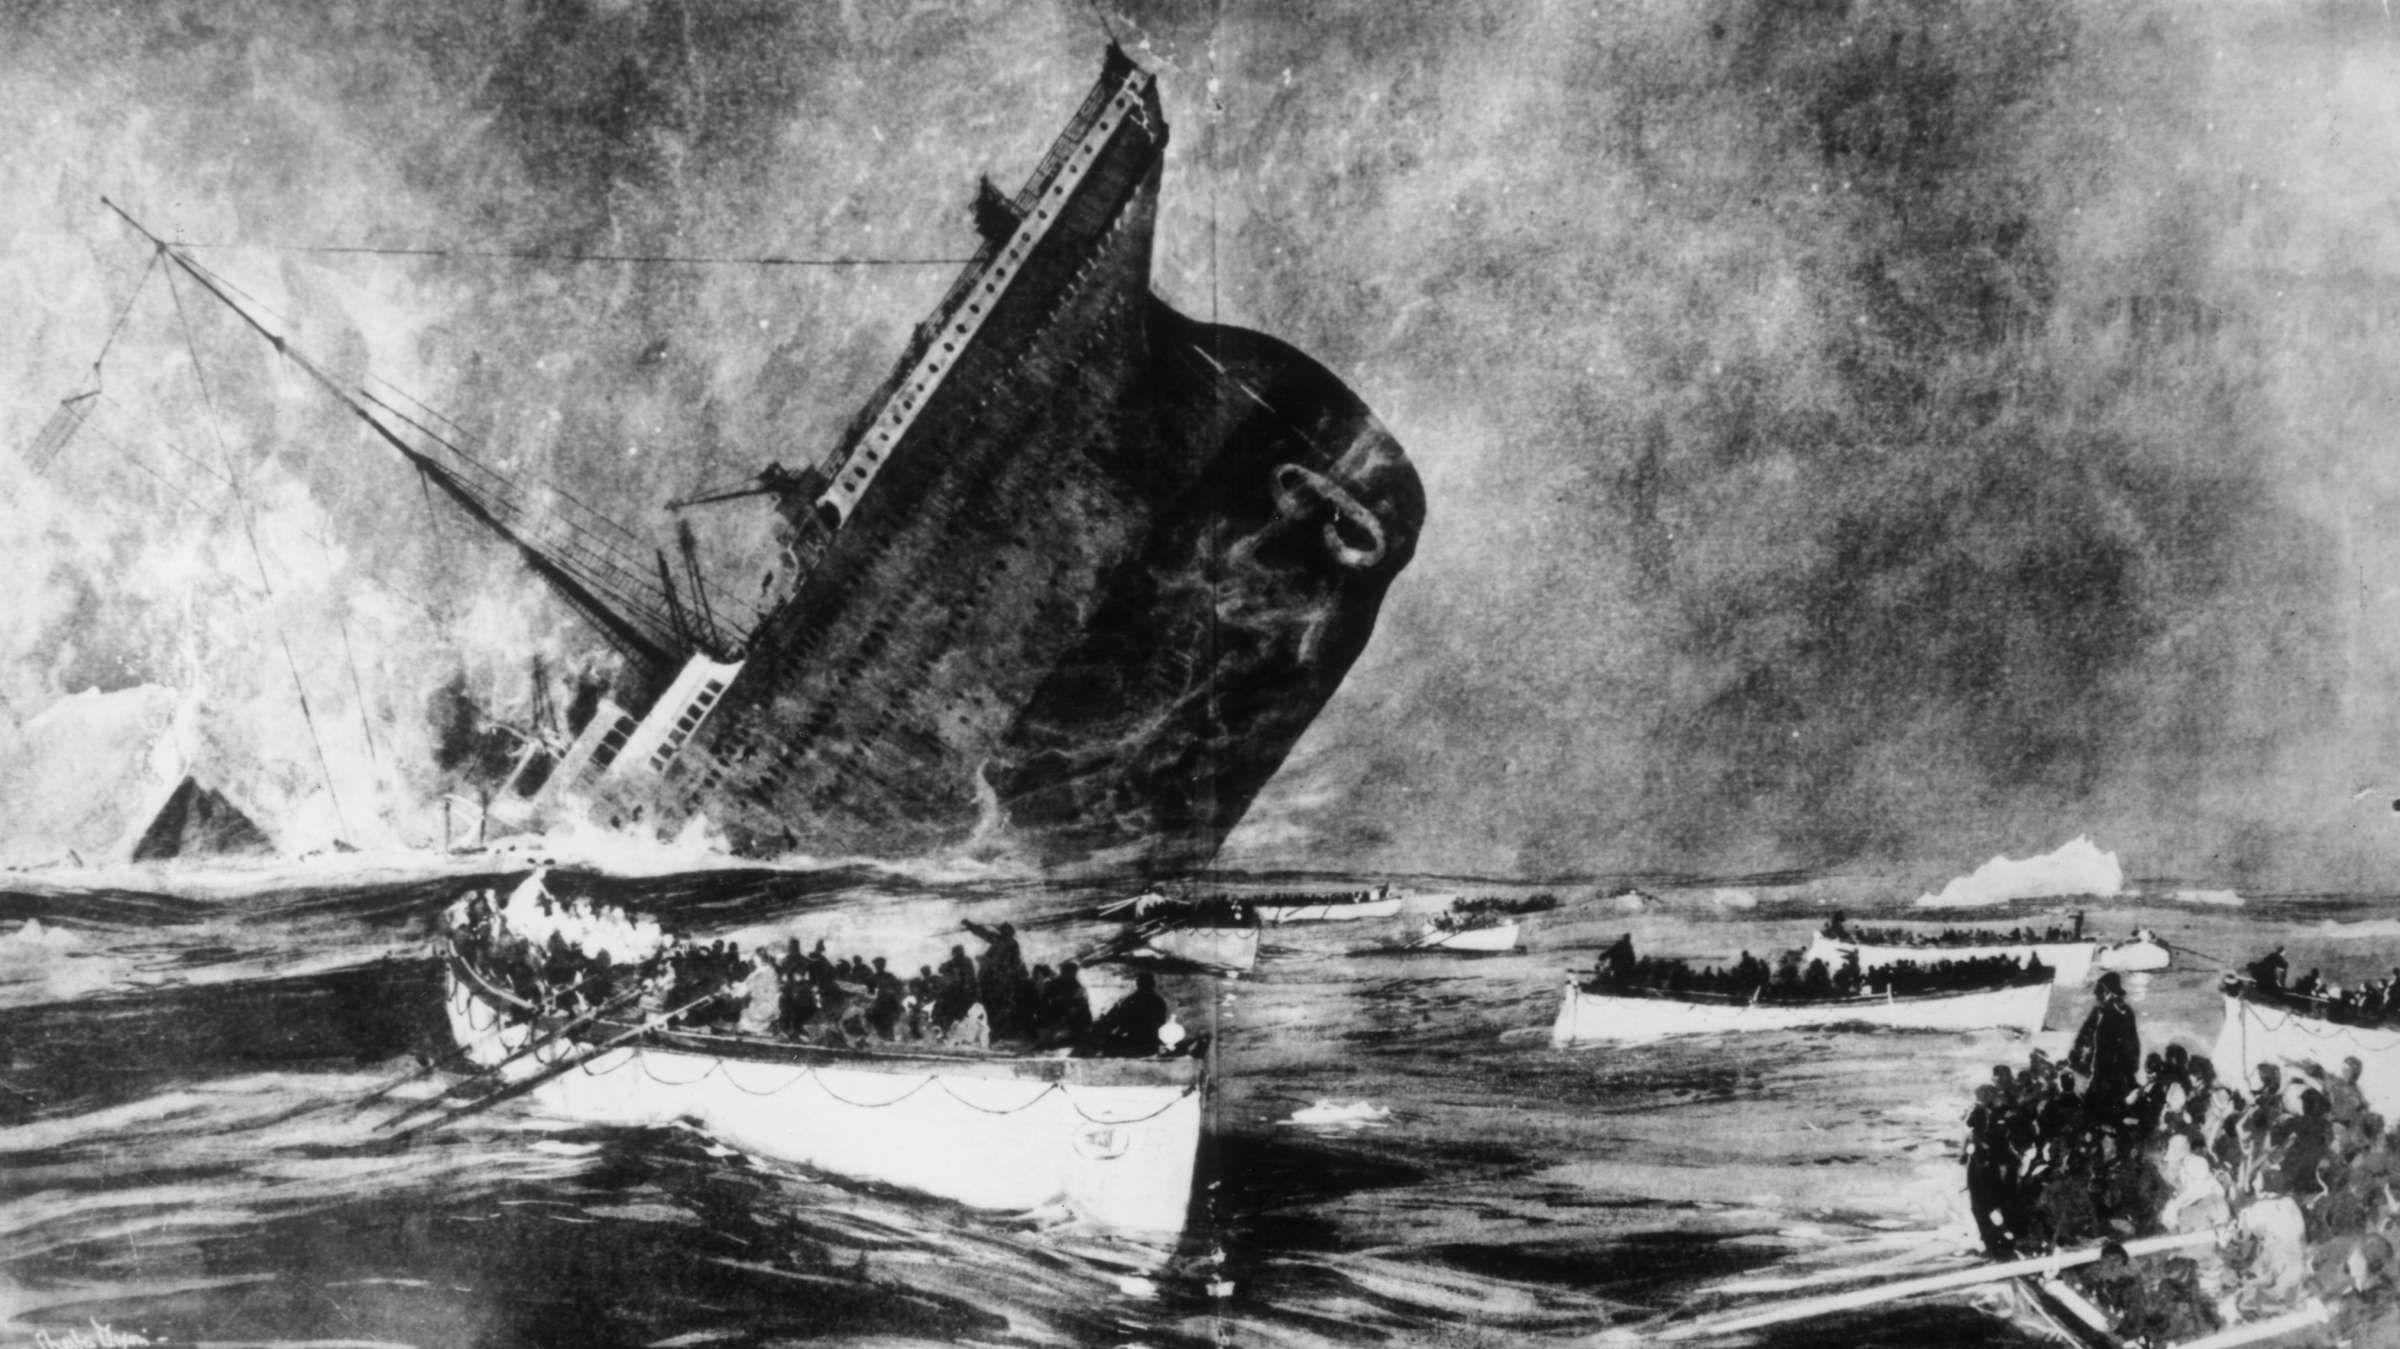 Watch <em>Titanic</em> Survivors Tell Their Stories in This Rare Video